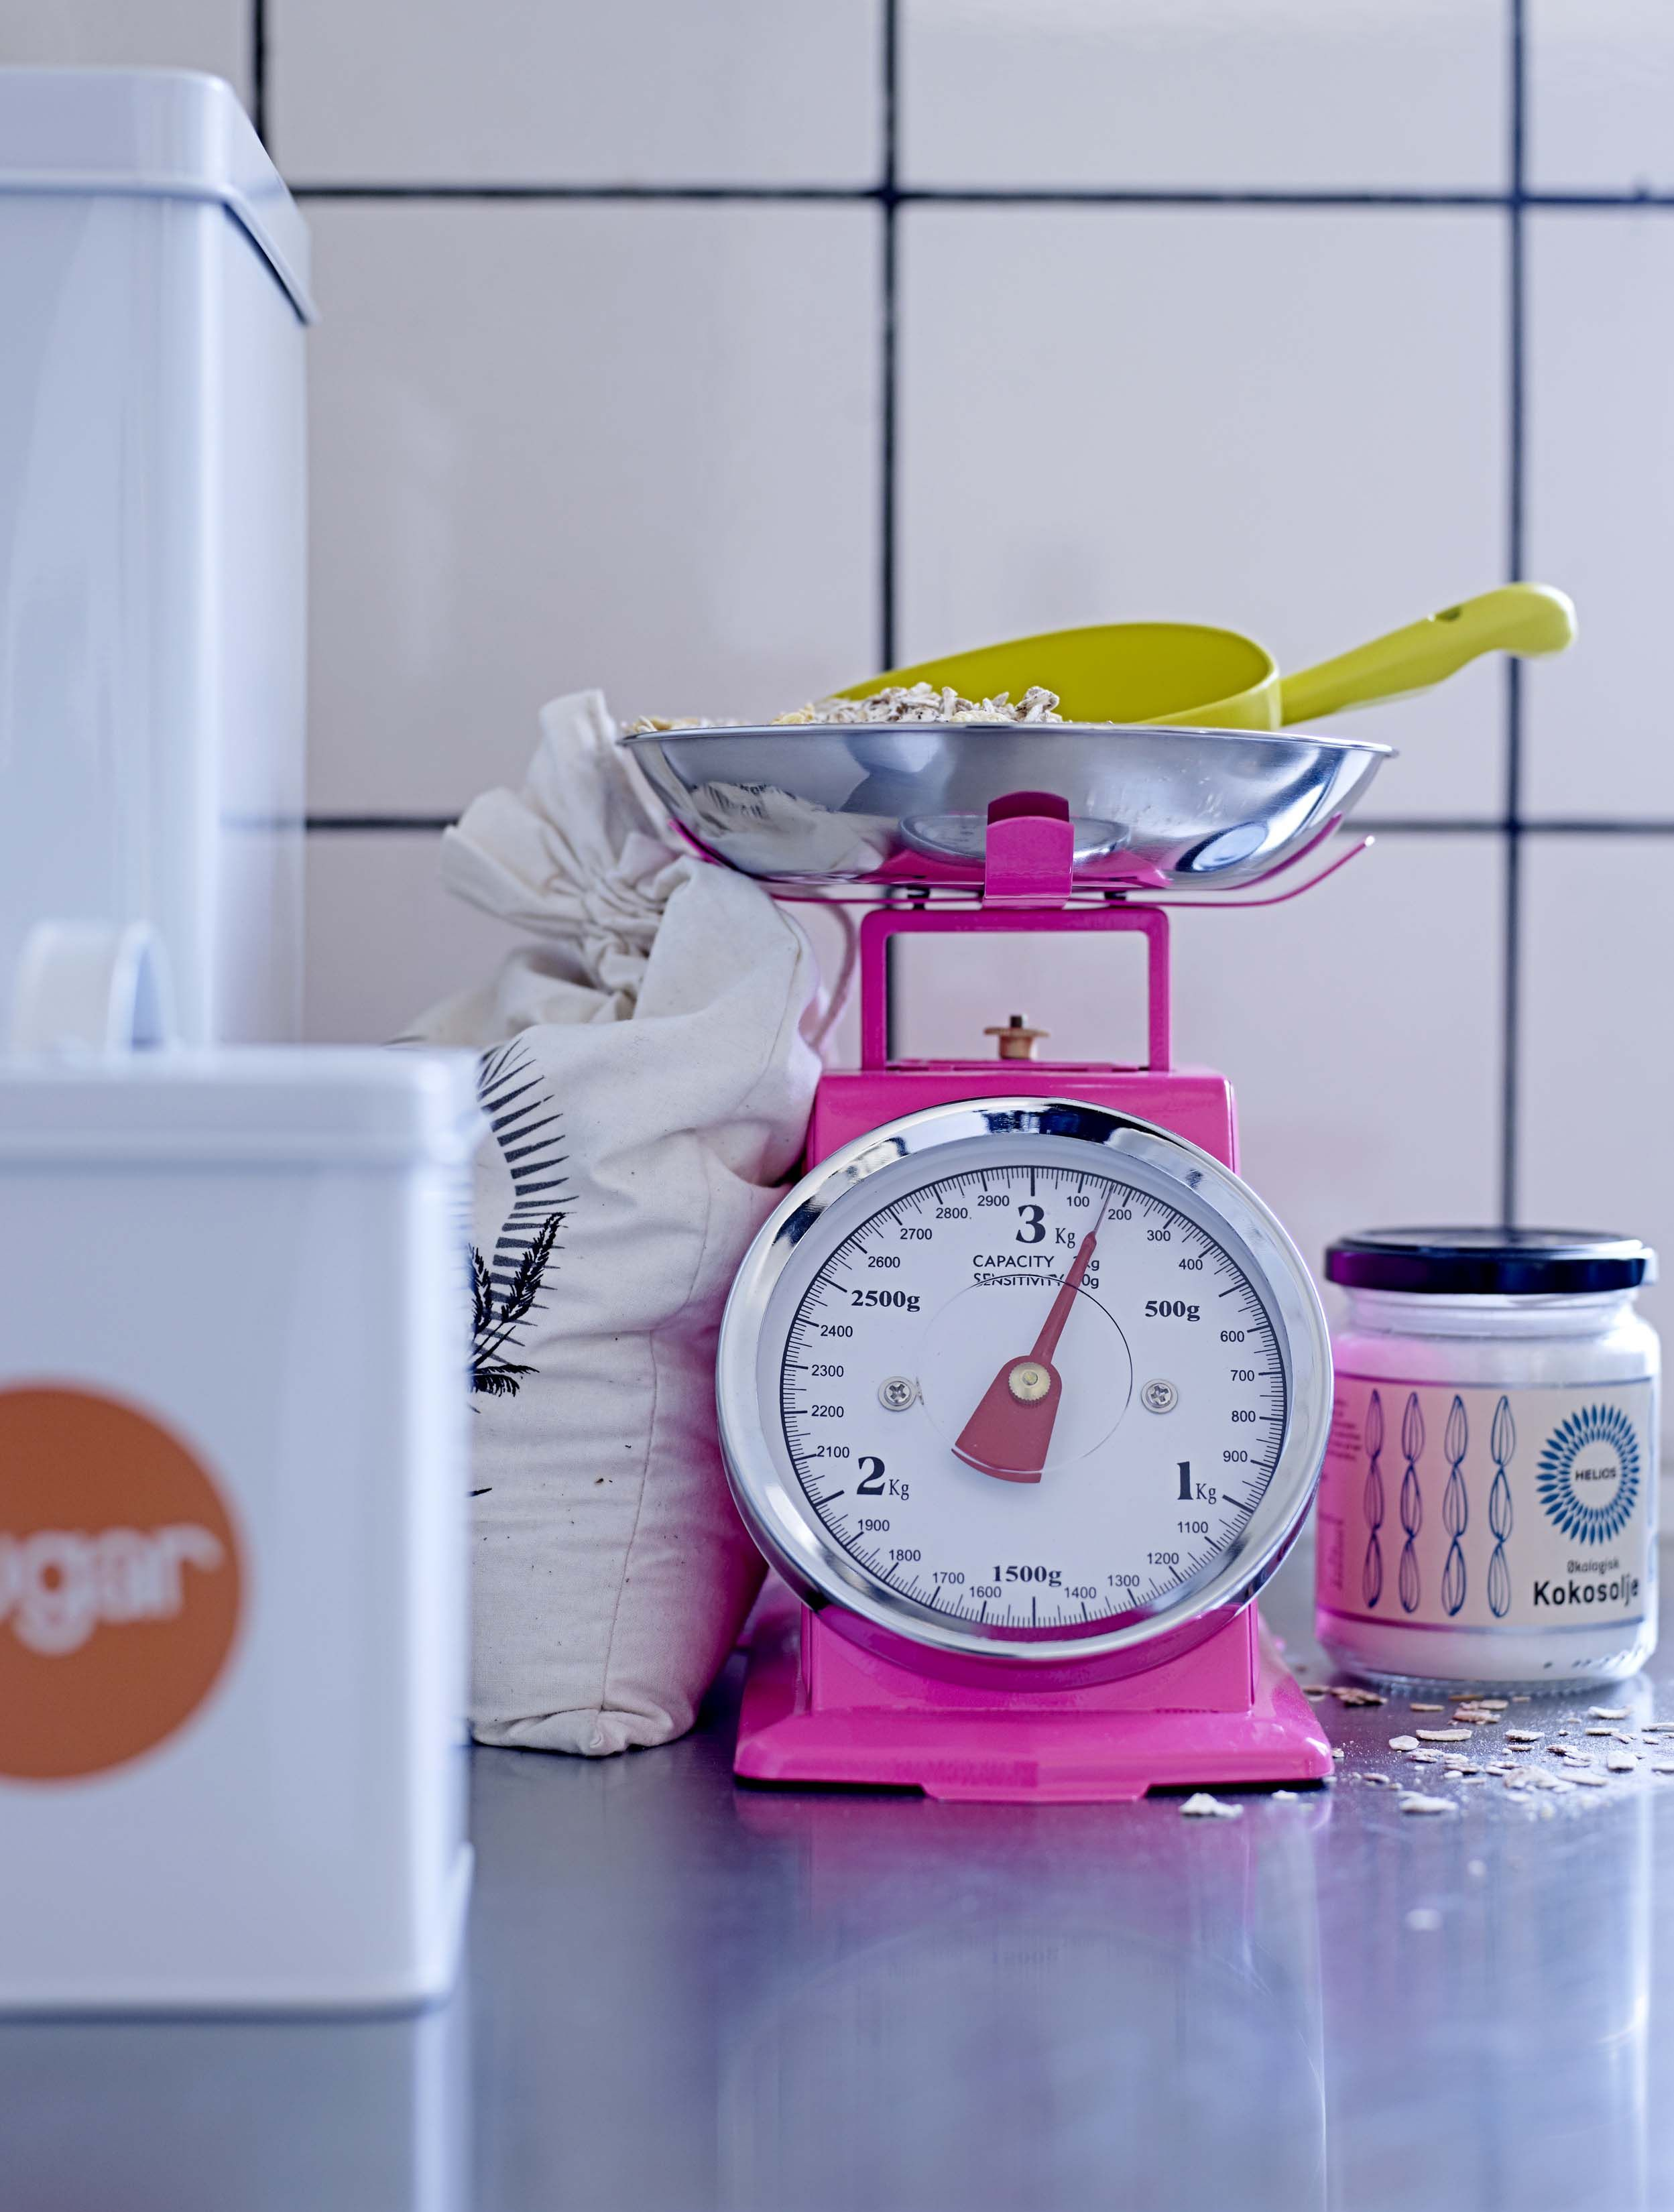 Küchenfarbe ideen gelb neon pink kitchen scale from bloomingville bloomingville